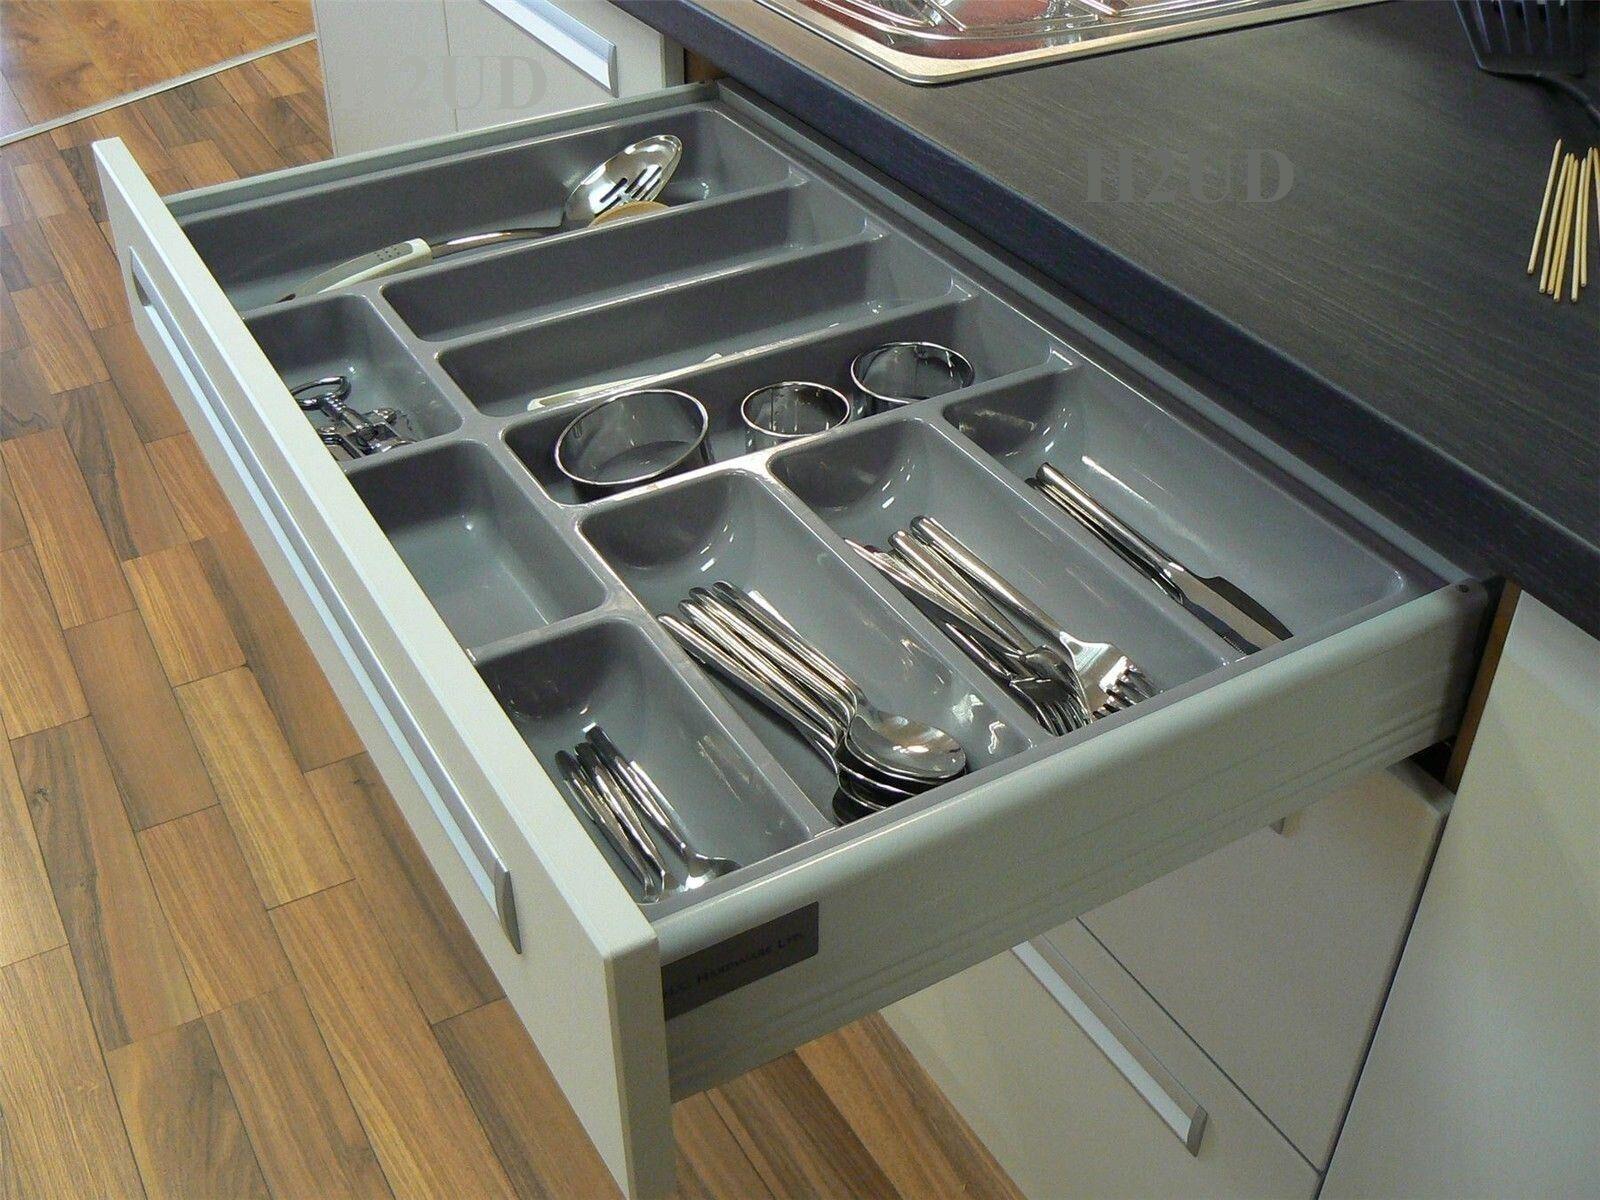 Kitchen drawer accessories uk - Quality Plastic Cutlery Trays Kitchen Drawers Blum Tandembox Inserts